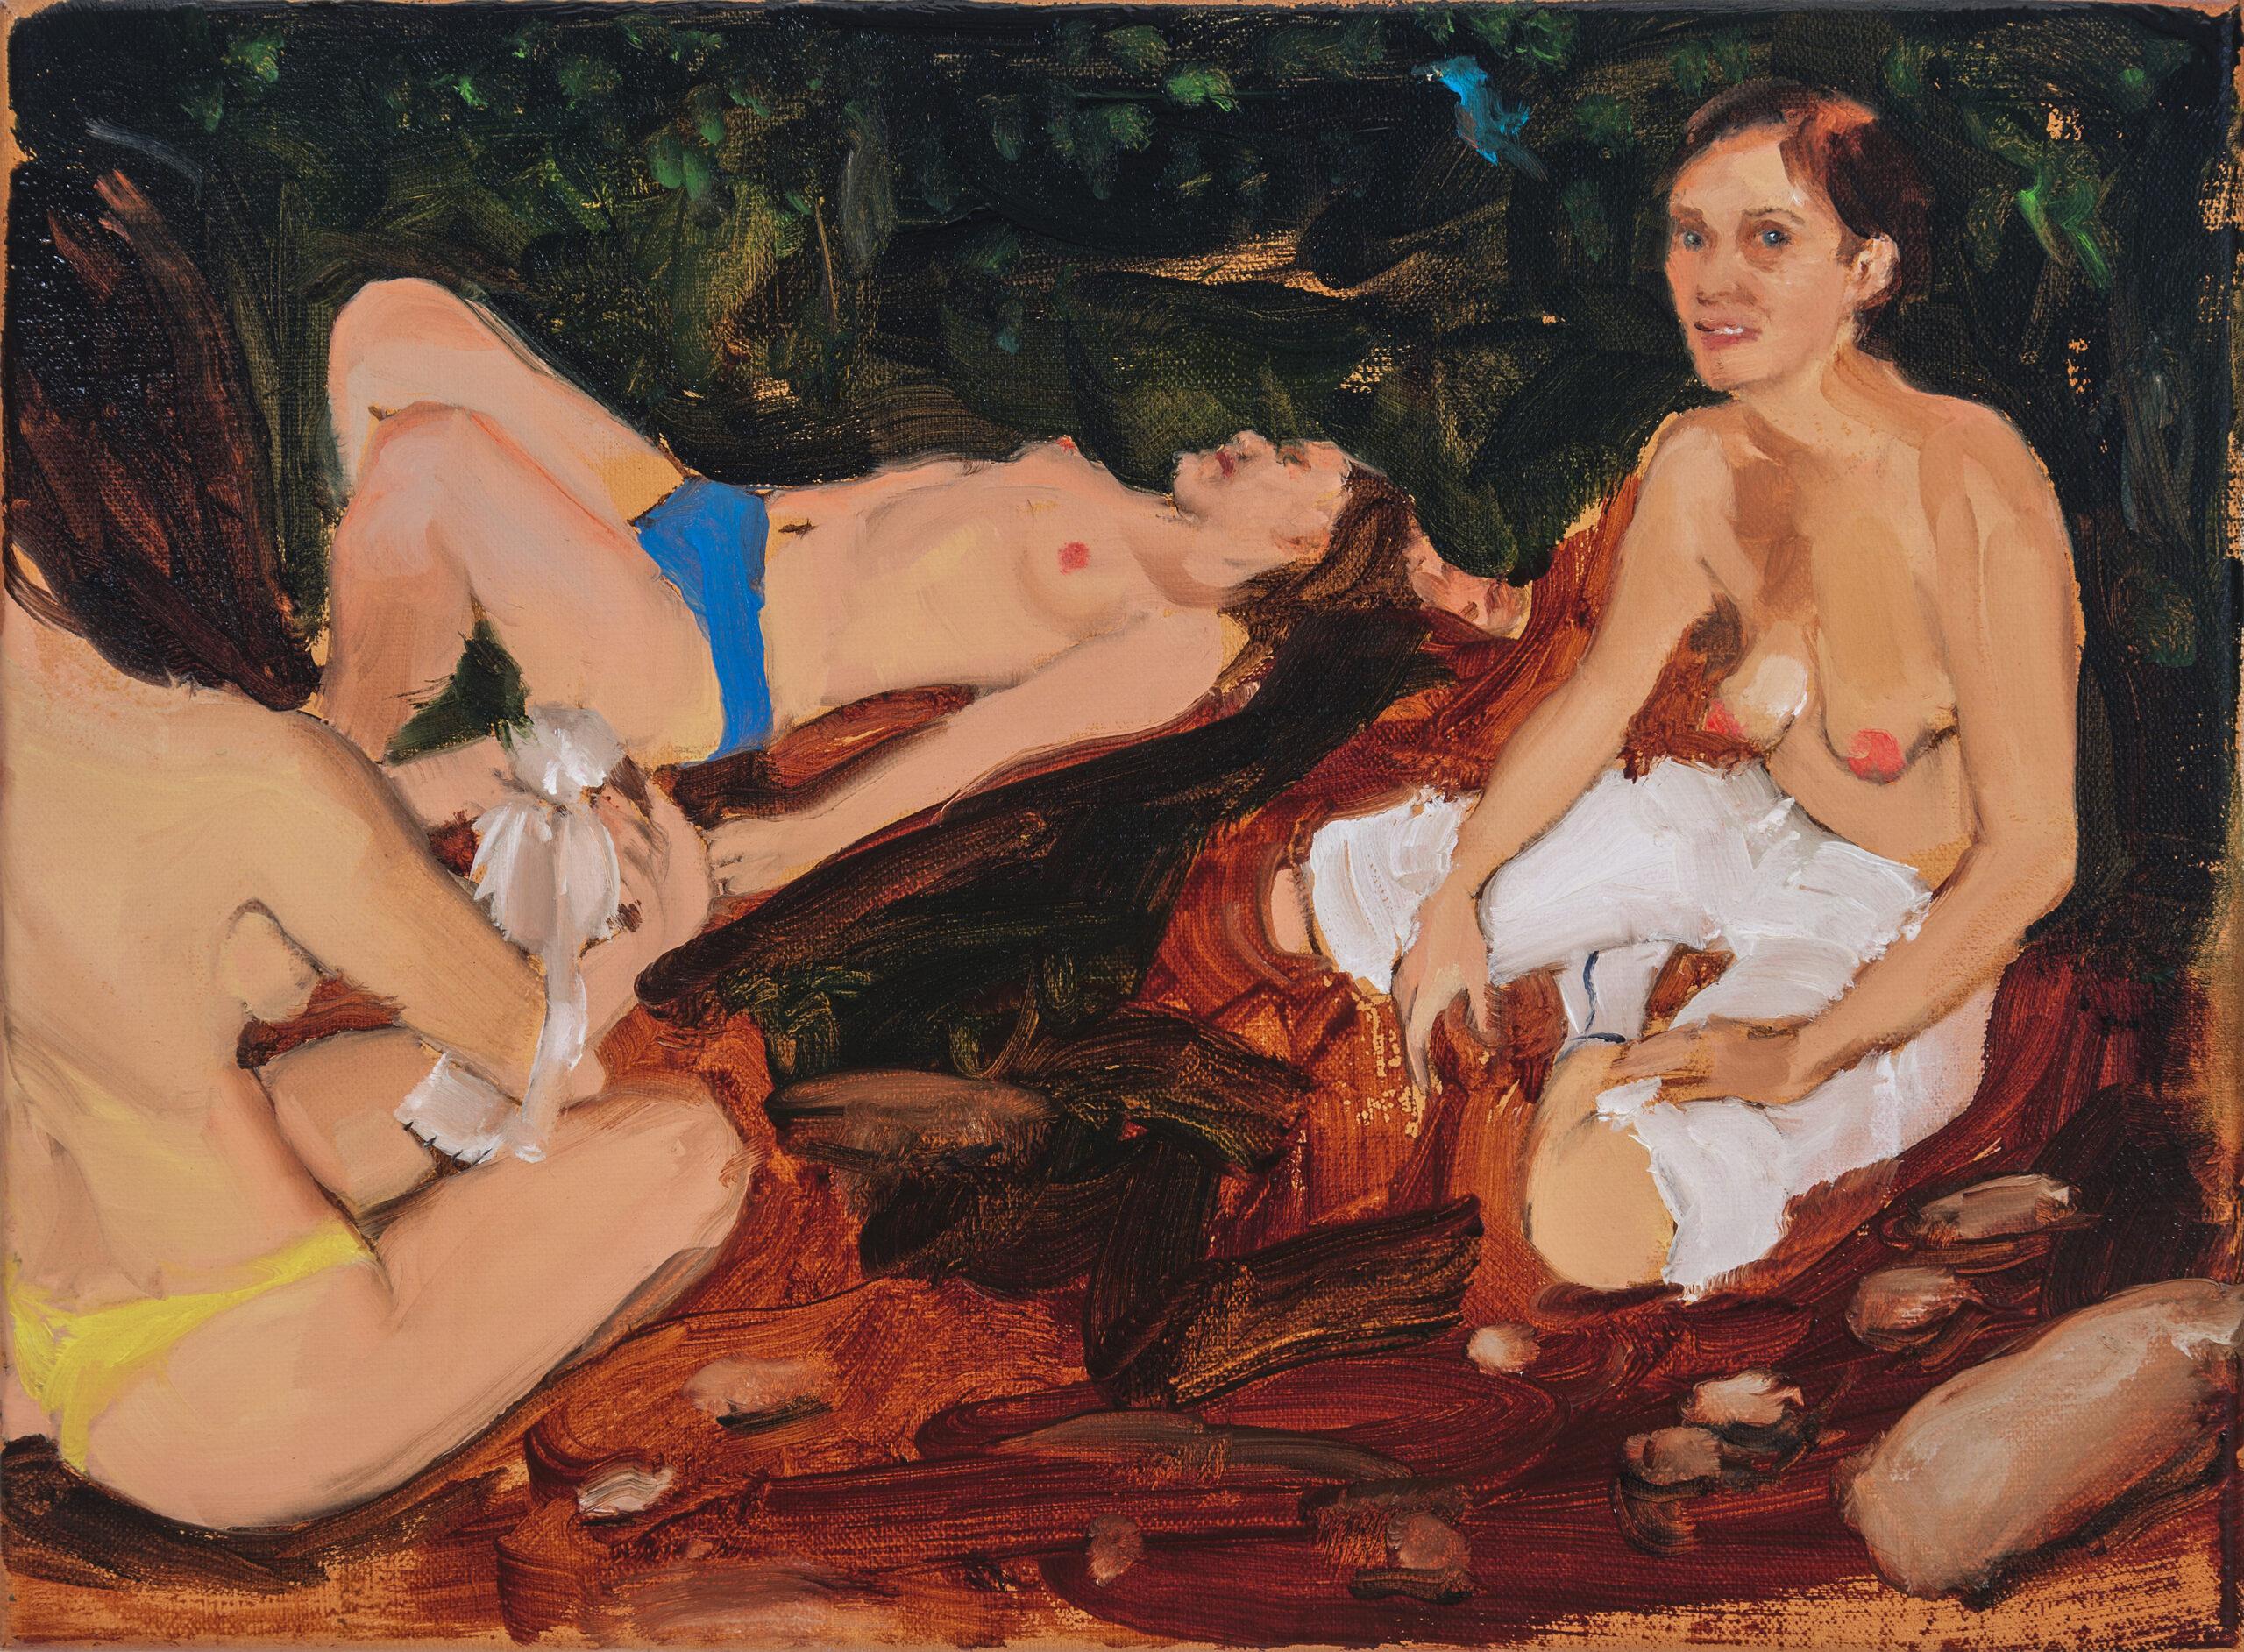 Jenna Gribbon, Talia, Hannah and Emily in my living room waiting to wrestle, 2019. Oil on linen, Courtesy of the artist and Fredericks & Freiser, New York.